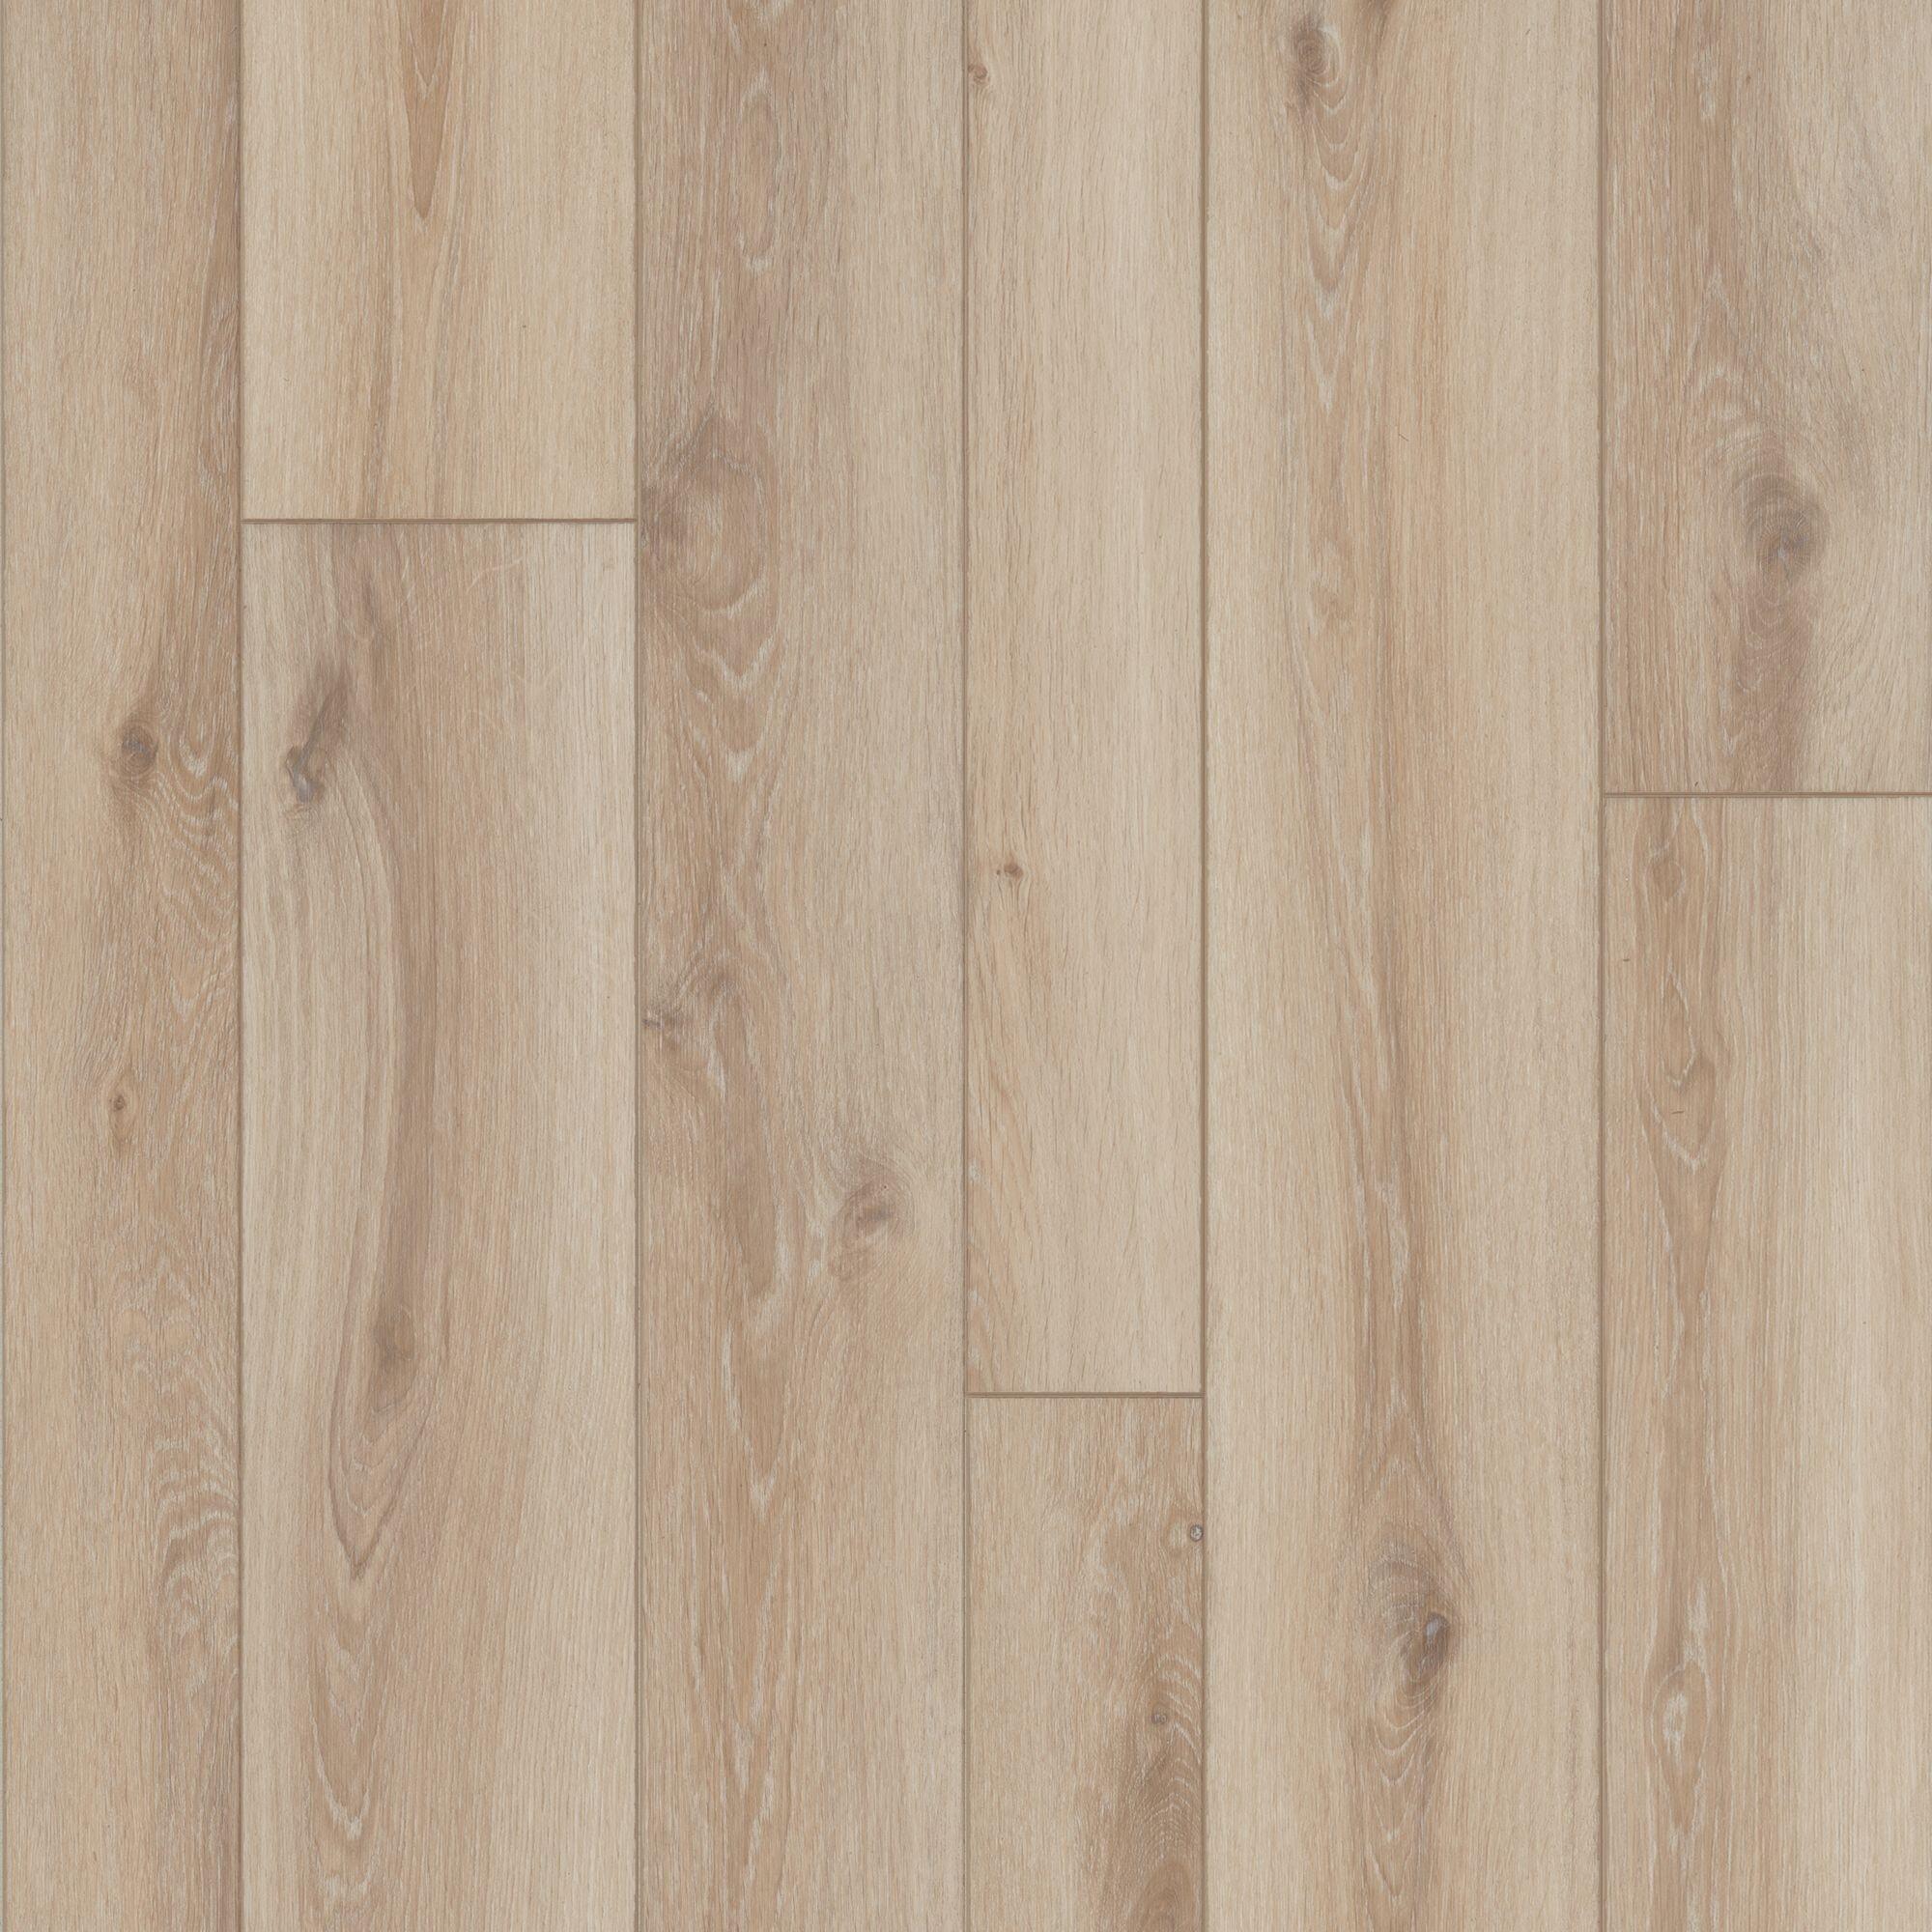 Armstrong Flooring Empower 4 3 X 72 X 7mm Oak Luxury Vinyl Plank Wayfair